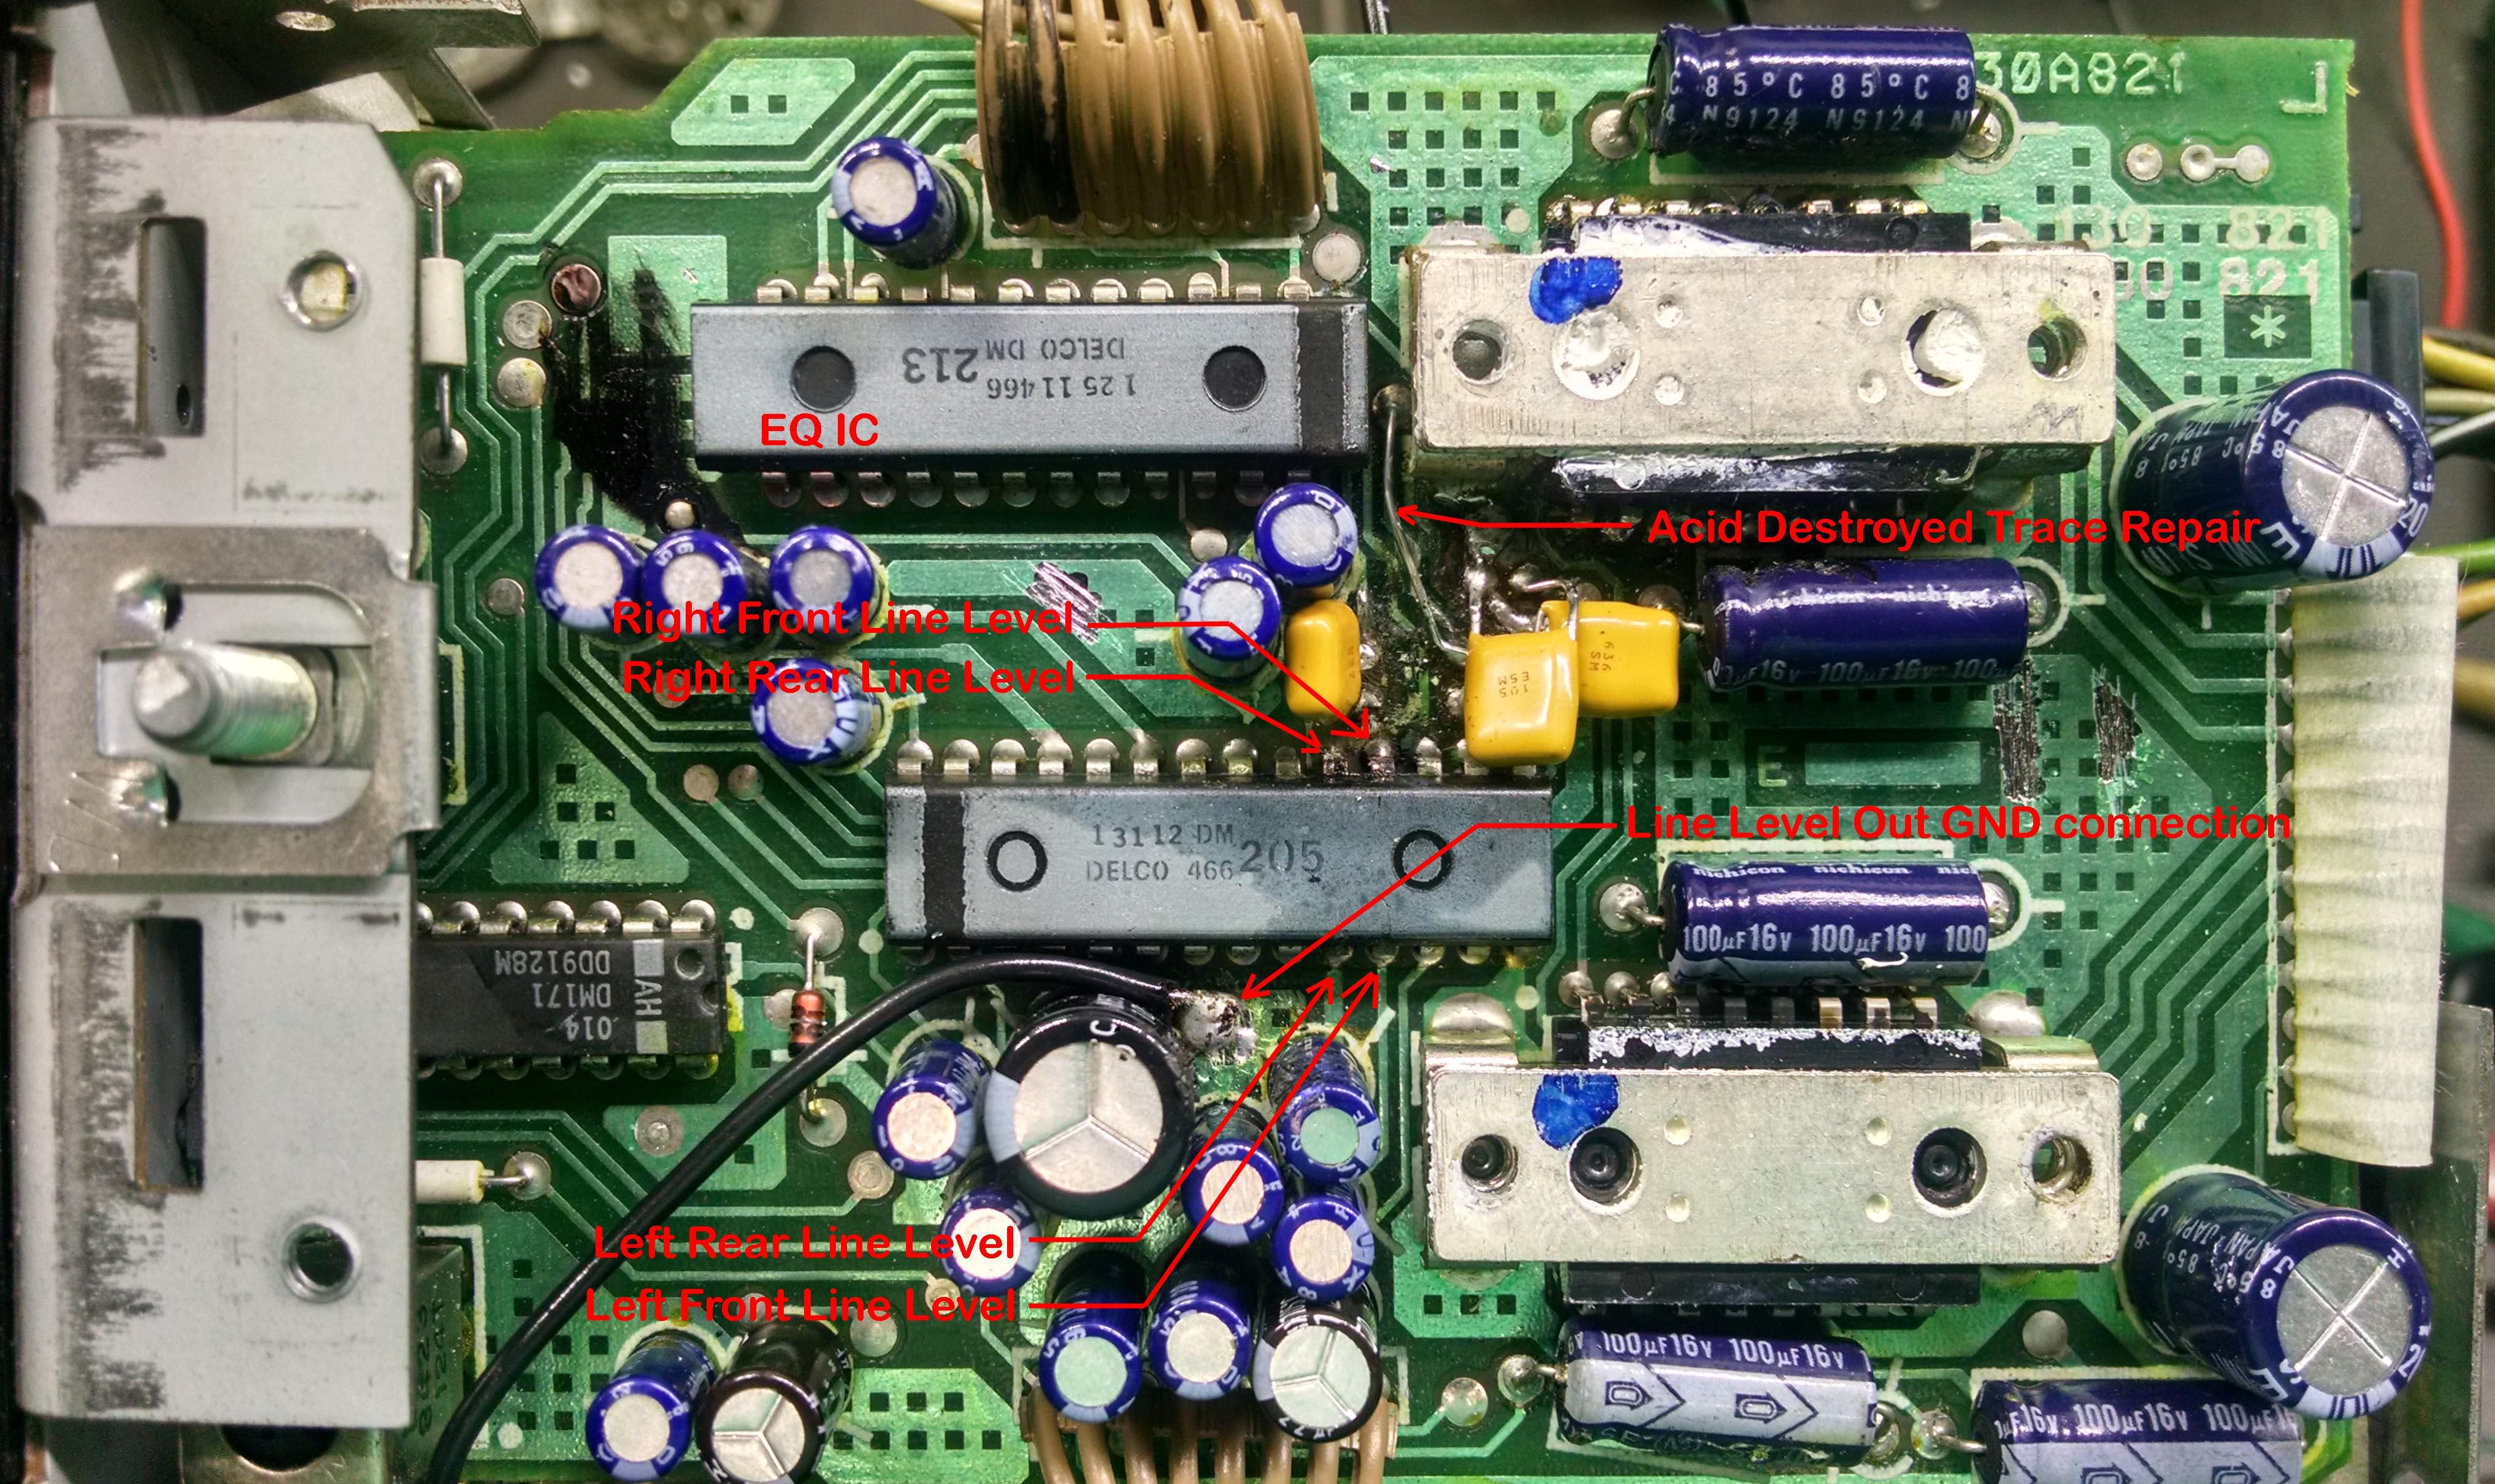 [DIAGRAM_5UK]  KH_9036] Gm Delco Bose Wiring Diagram Page 2 Schematic Wiring | Gm Delco Bose Wiring Diagram Page 2 |  | Rally Weveq Botse Amenti Vulg Shopa Mohammedshrine Librar Wiring 101